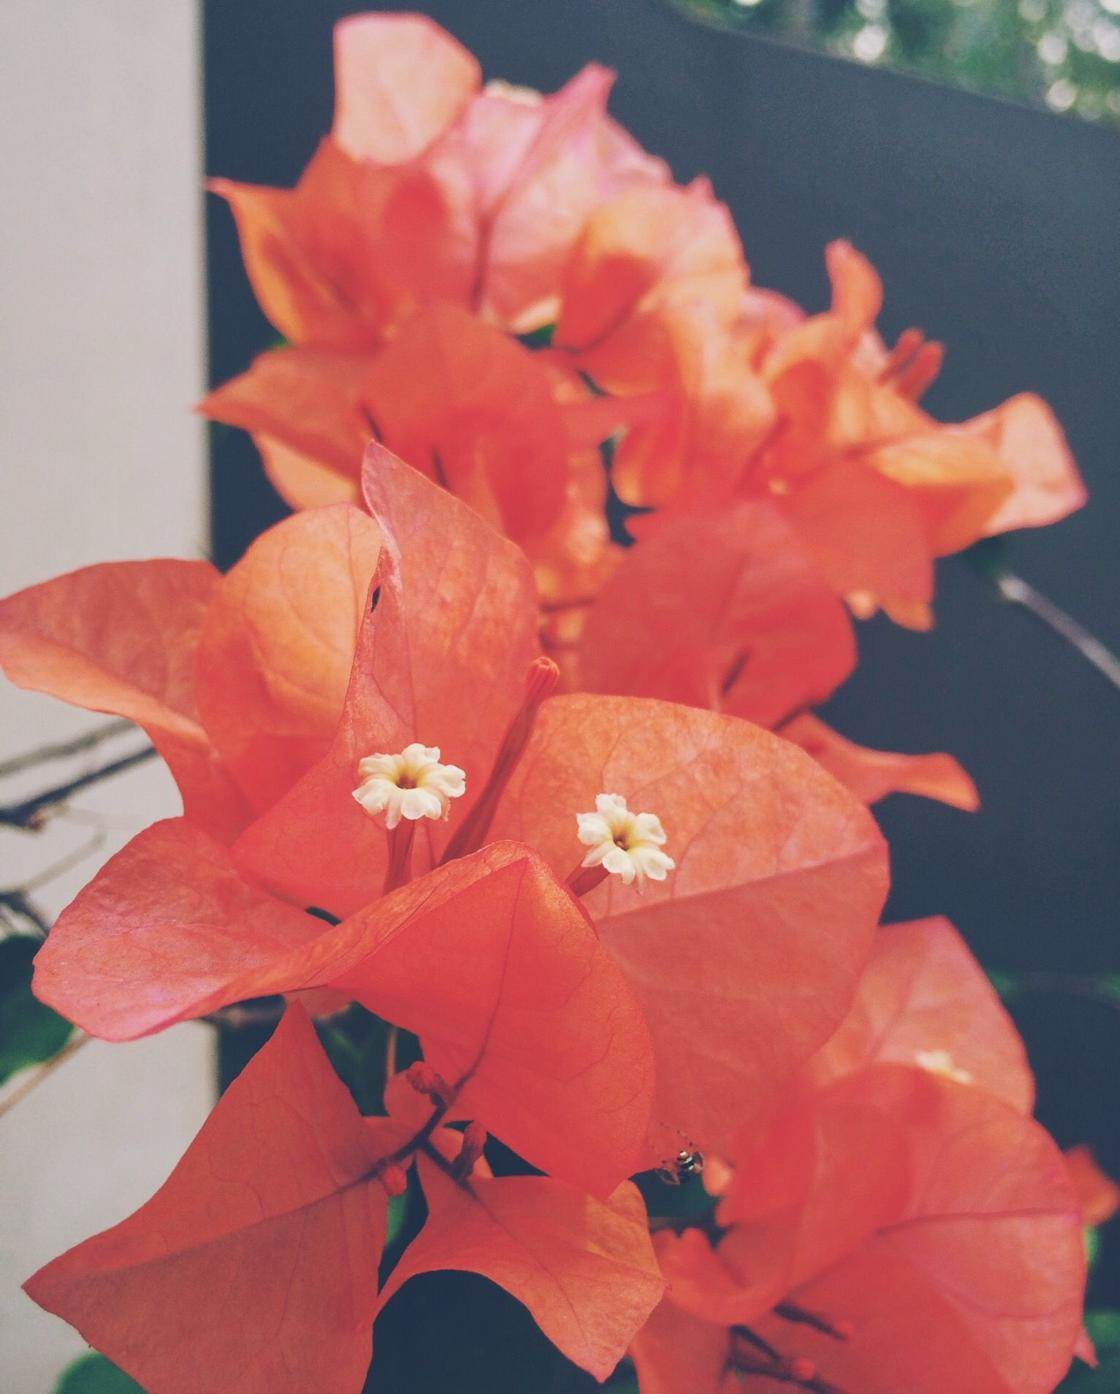 flowers iPhone photo contest-11 no script